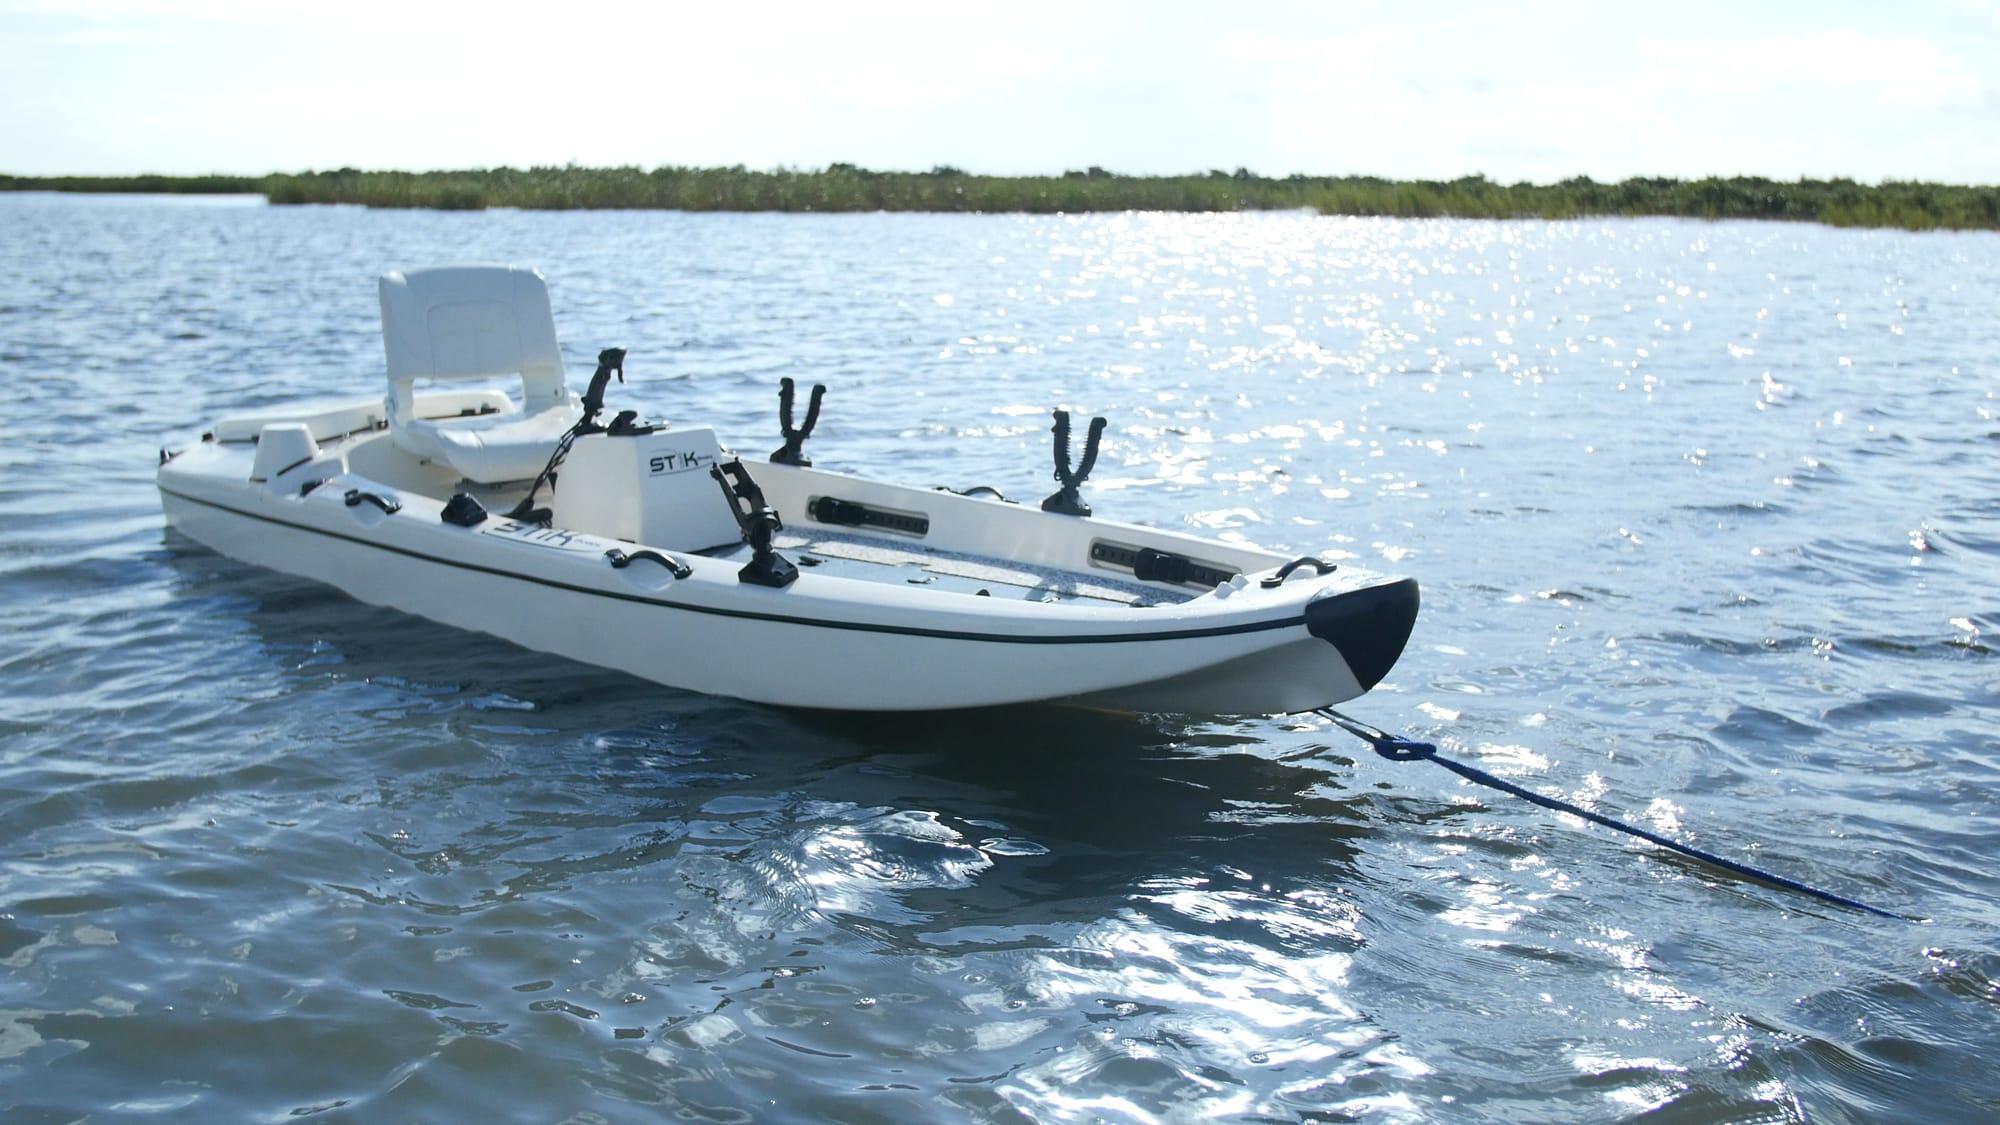 Stik Boat